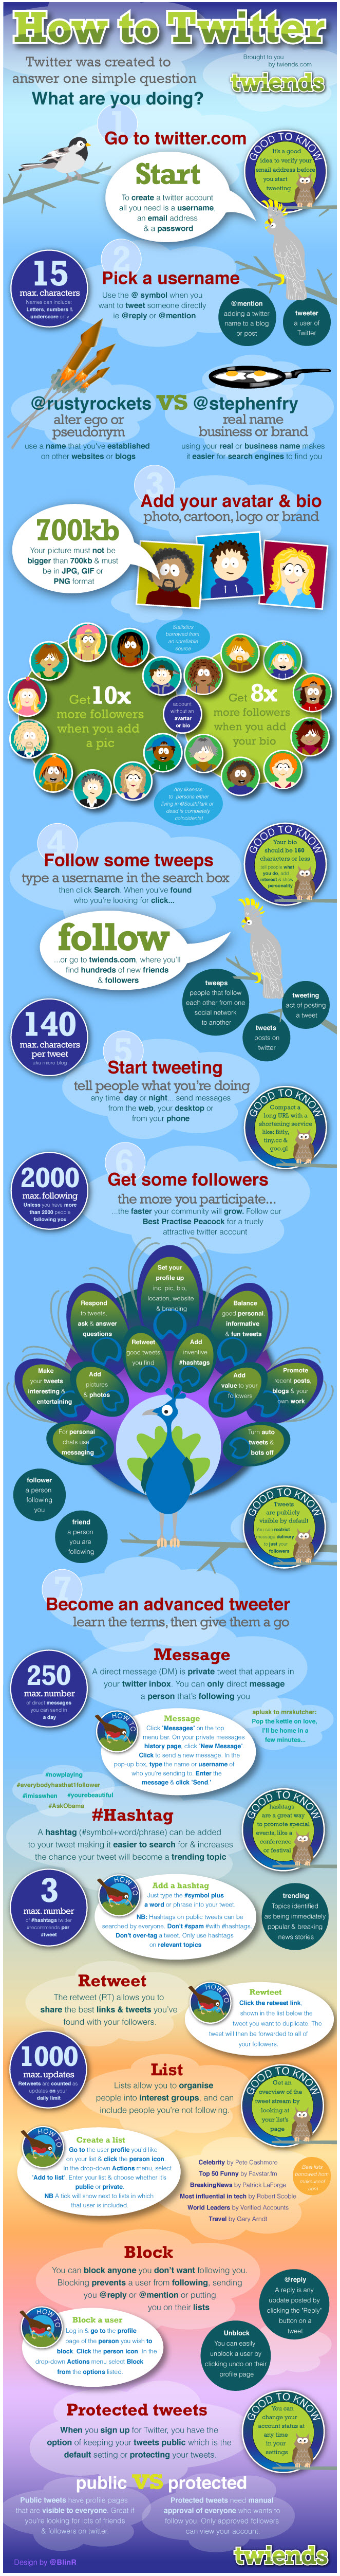 Twitter-Marketing-Infographic1